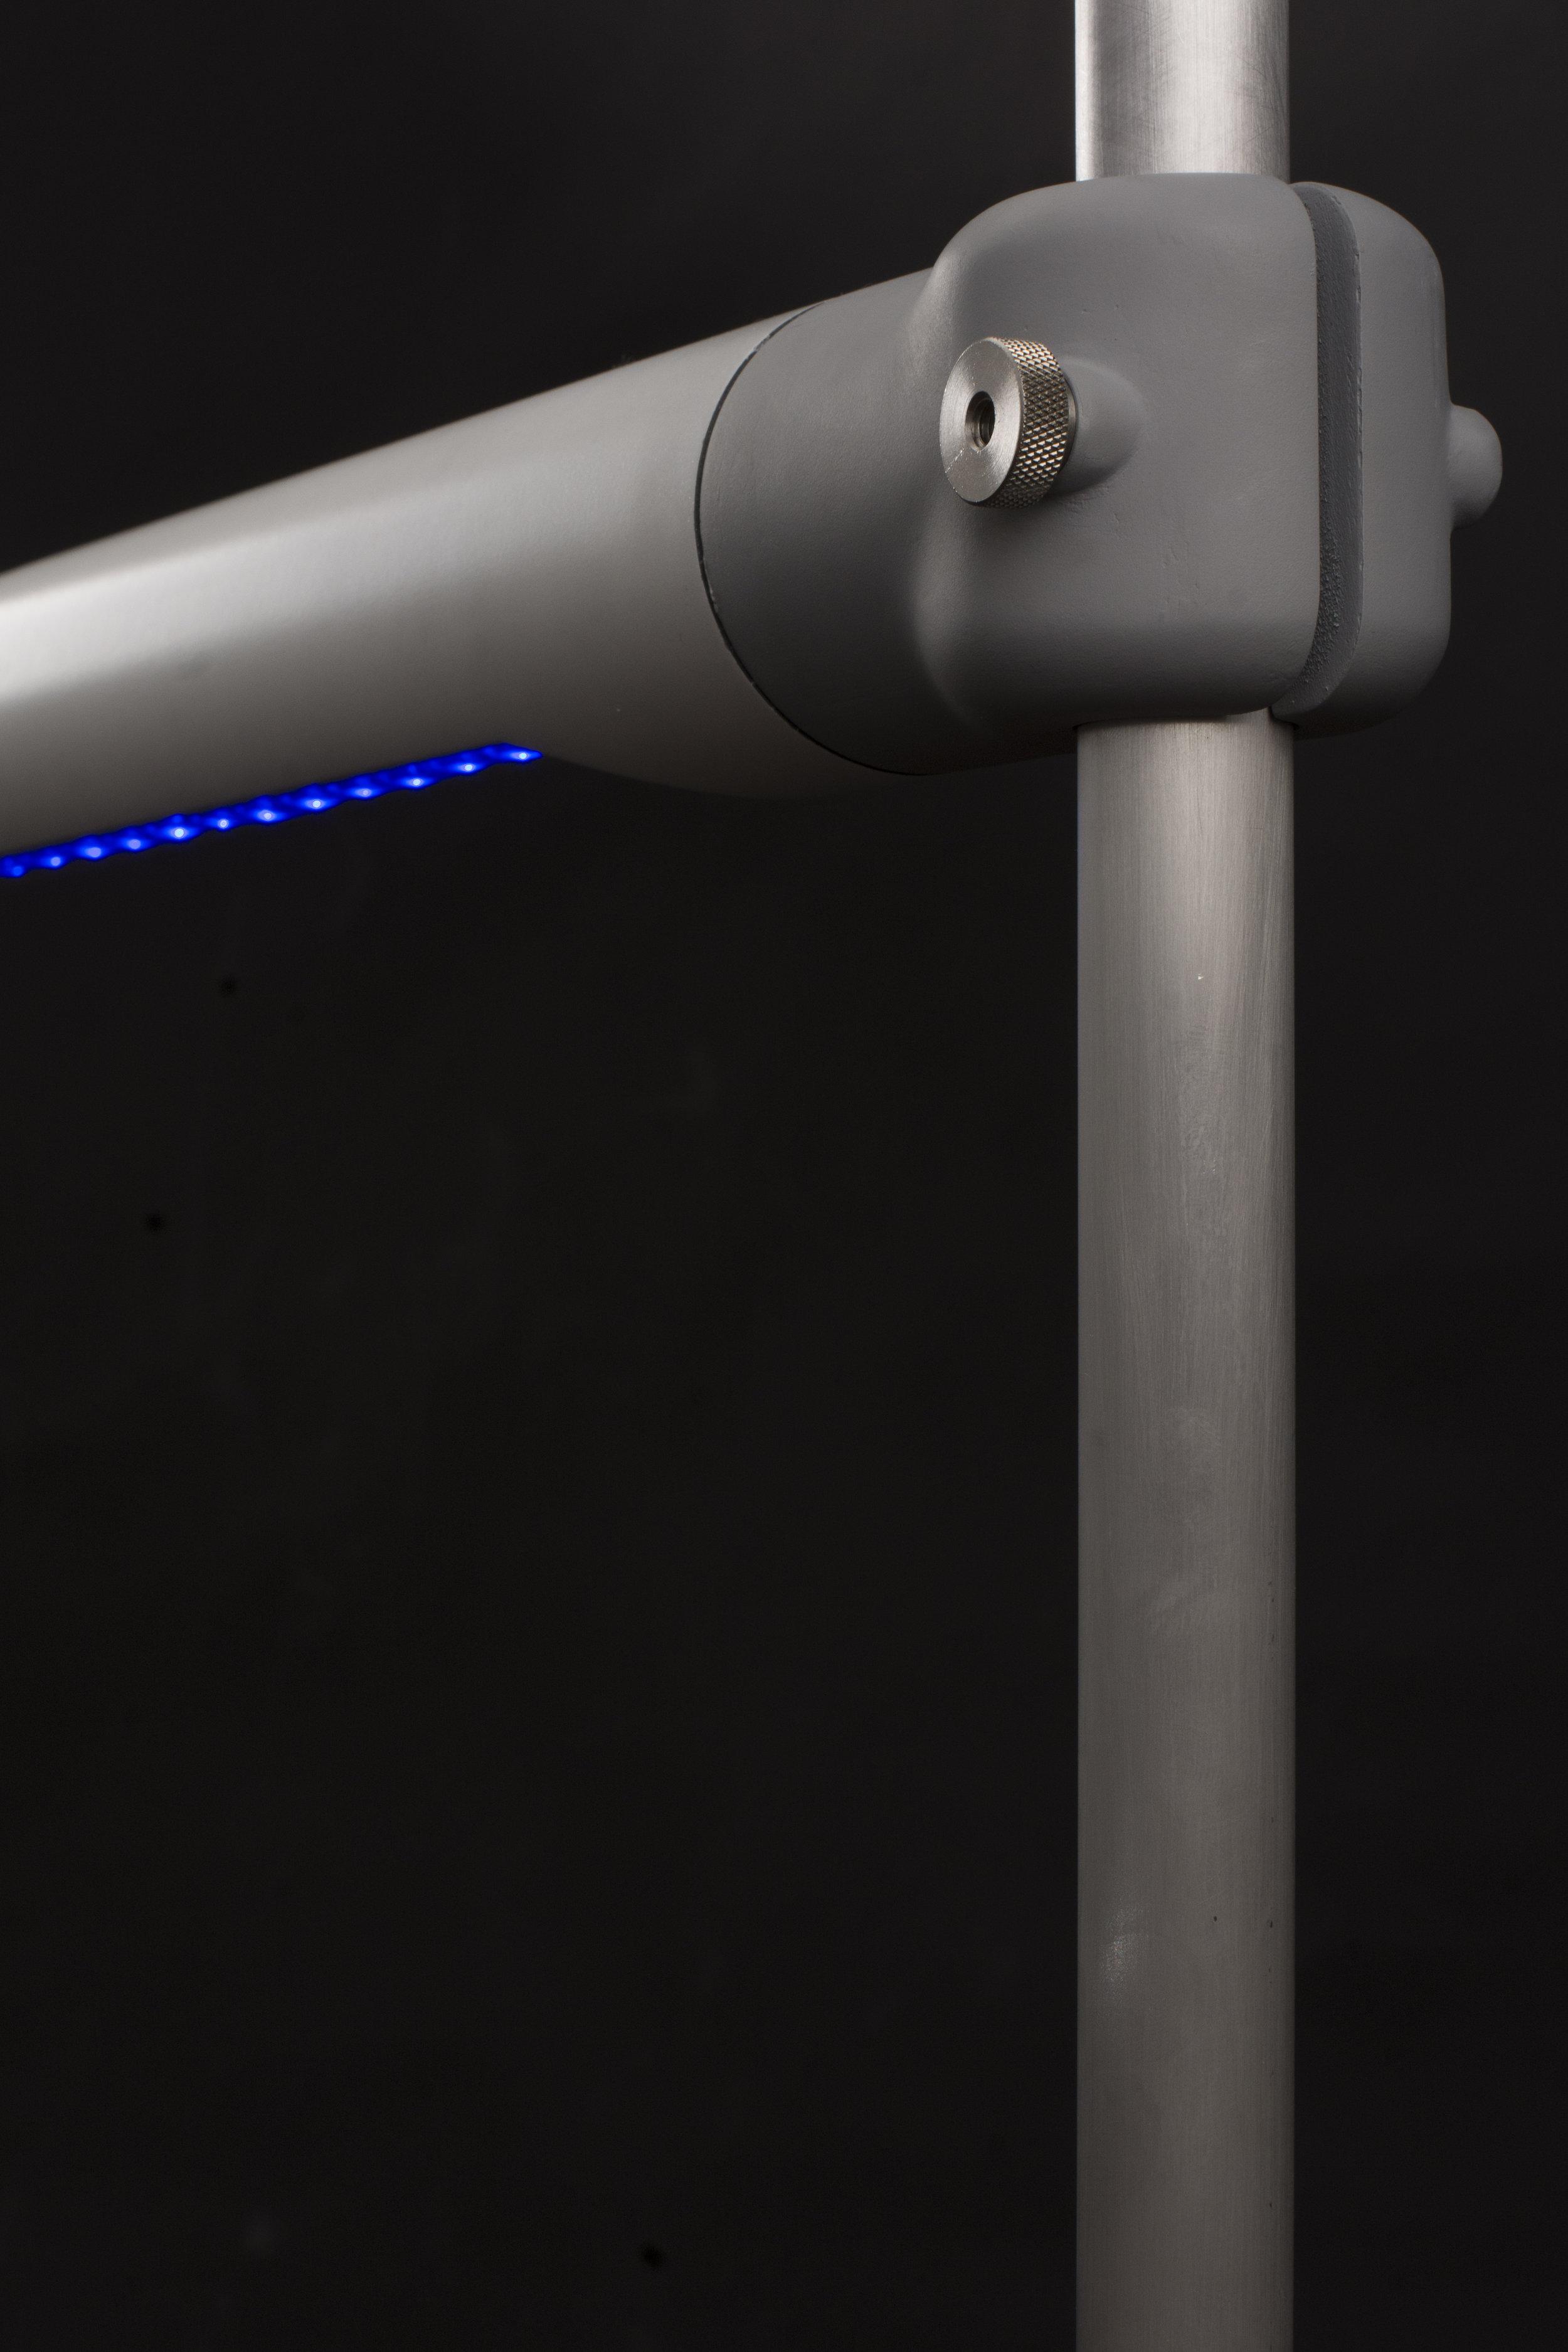 cameron_lamp_project0275.jpg